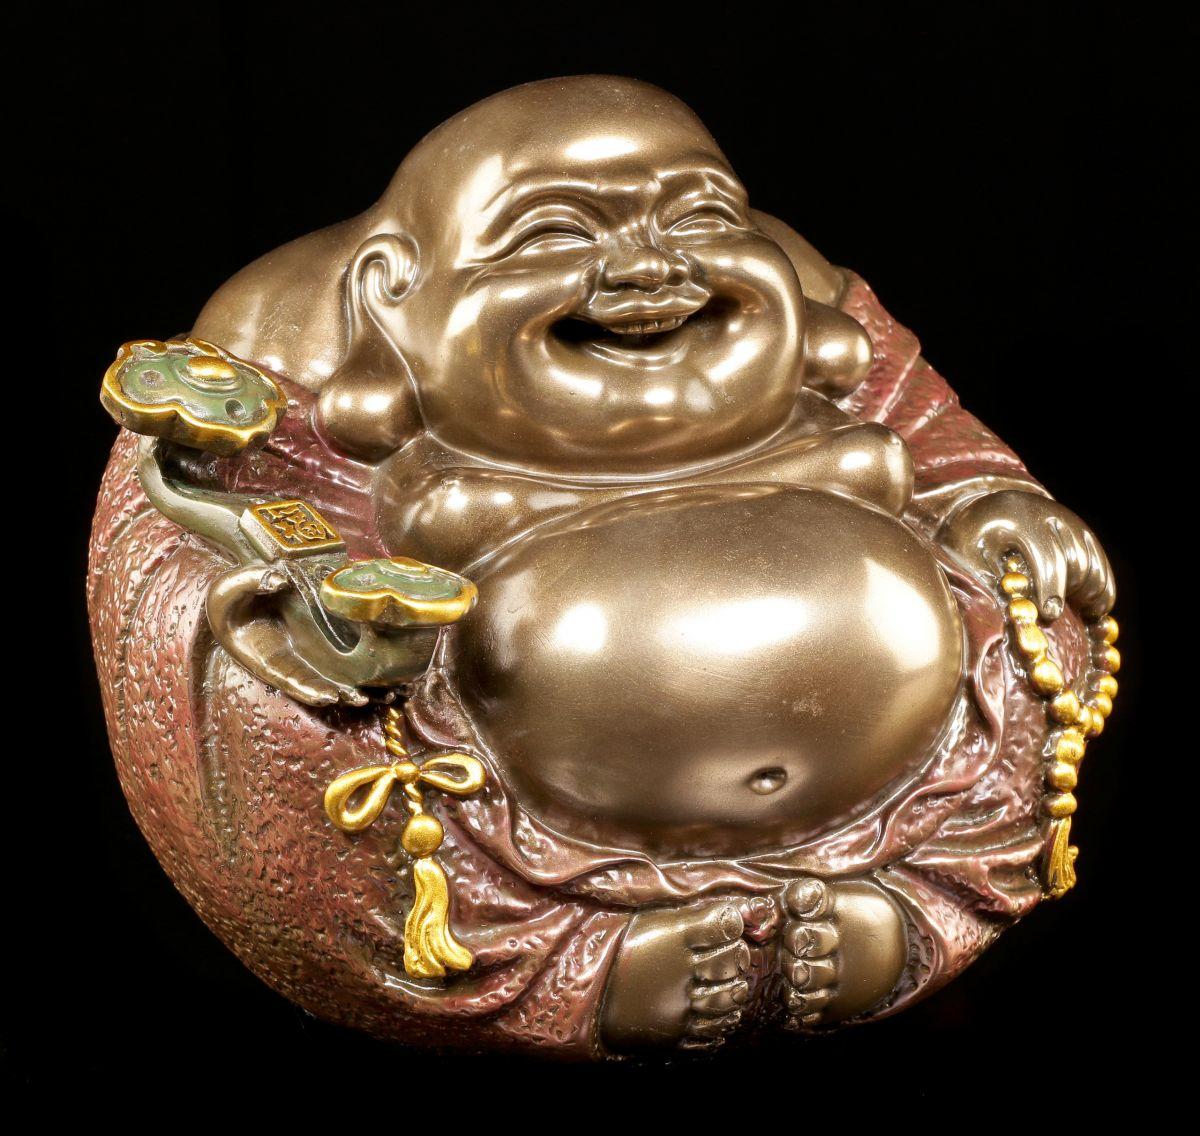 maitreya buddha figure present laughing thick belly ebay. Black Bedroom Furniture Sets. Home Design Ideas